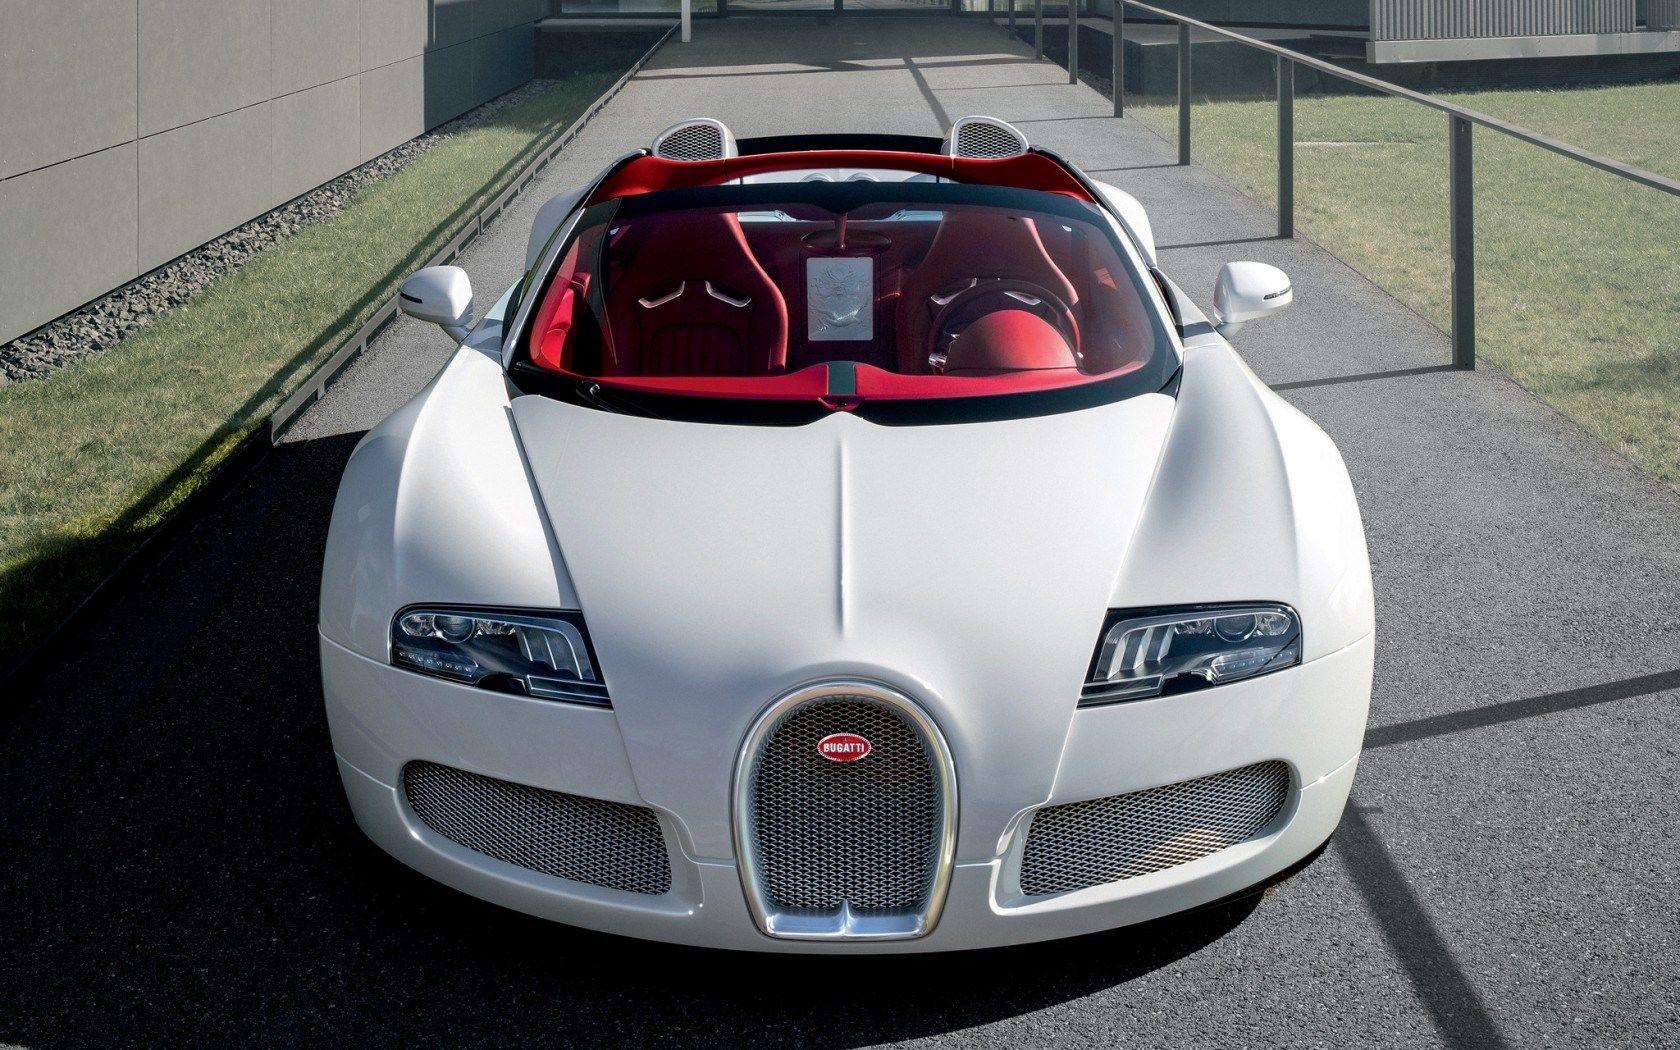 1430943 Free Download Bugatti Veyron Wallpaper Wallpaperscreator